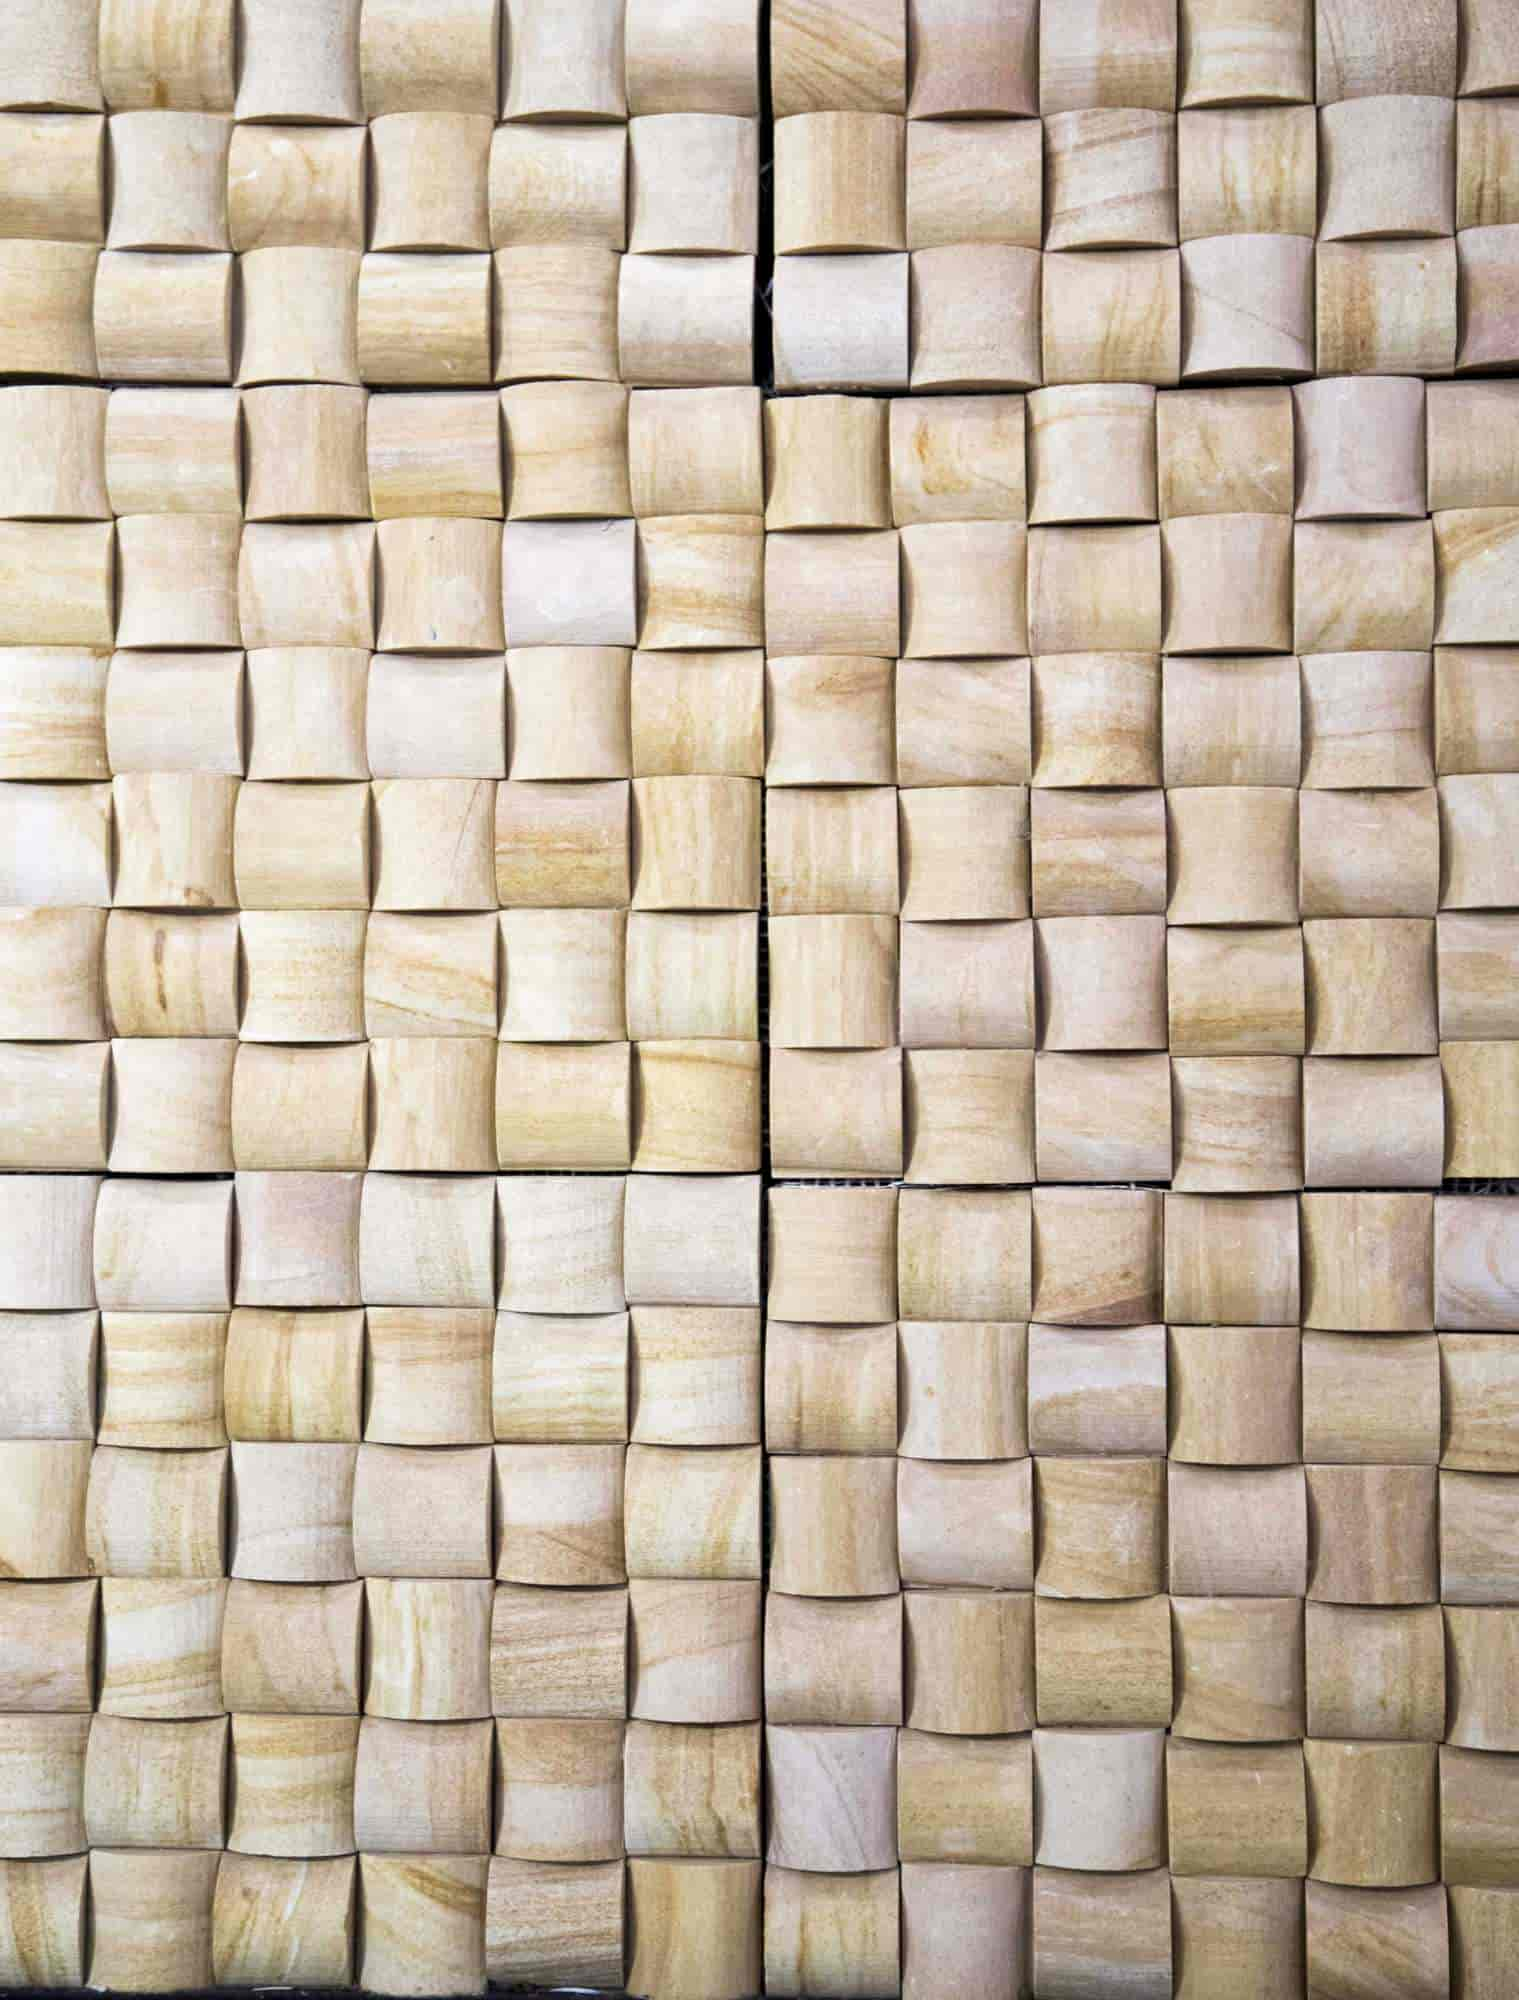 Shree marbles rasulgarh sree marbles tile dealers in shree marbles rasulgarh sree marbles tile dealers in bhubaneshwar justdial doublecrazyfo Choice Image